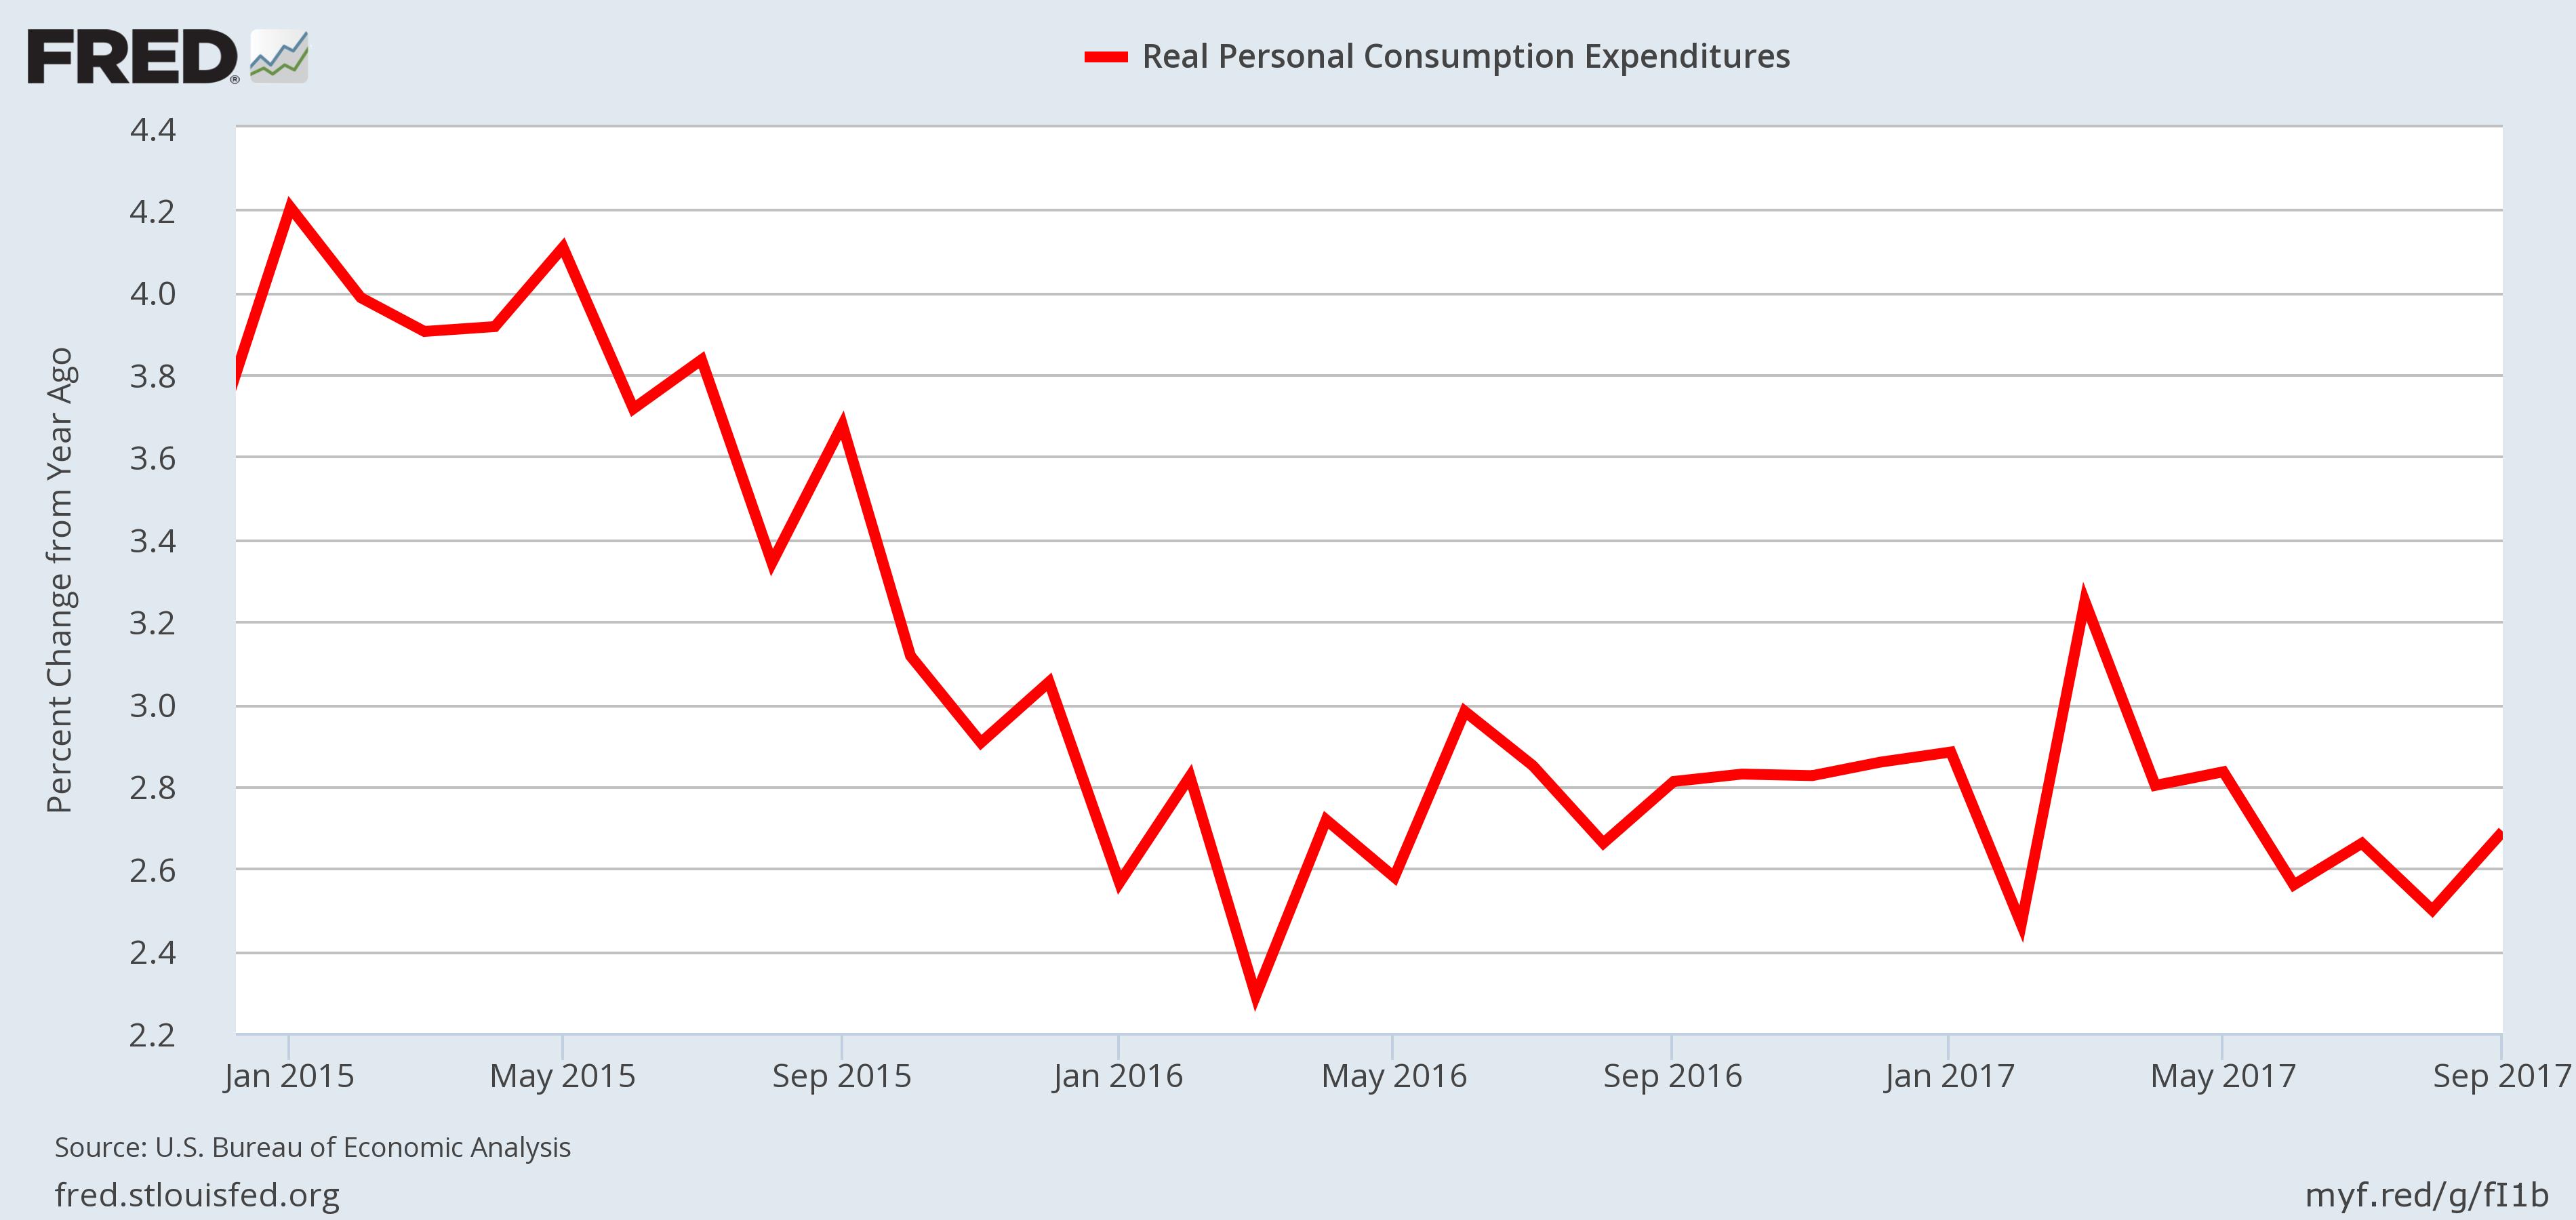 U.S. Economy - Personal Consumption